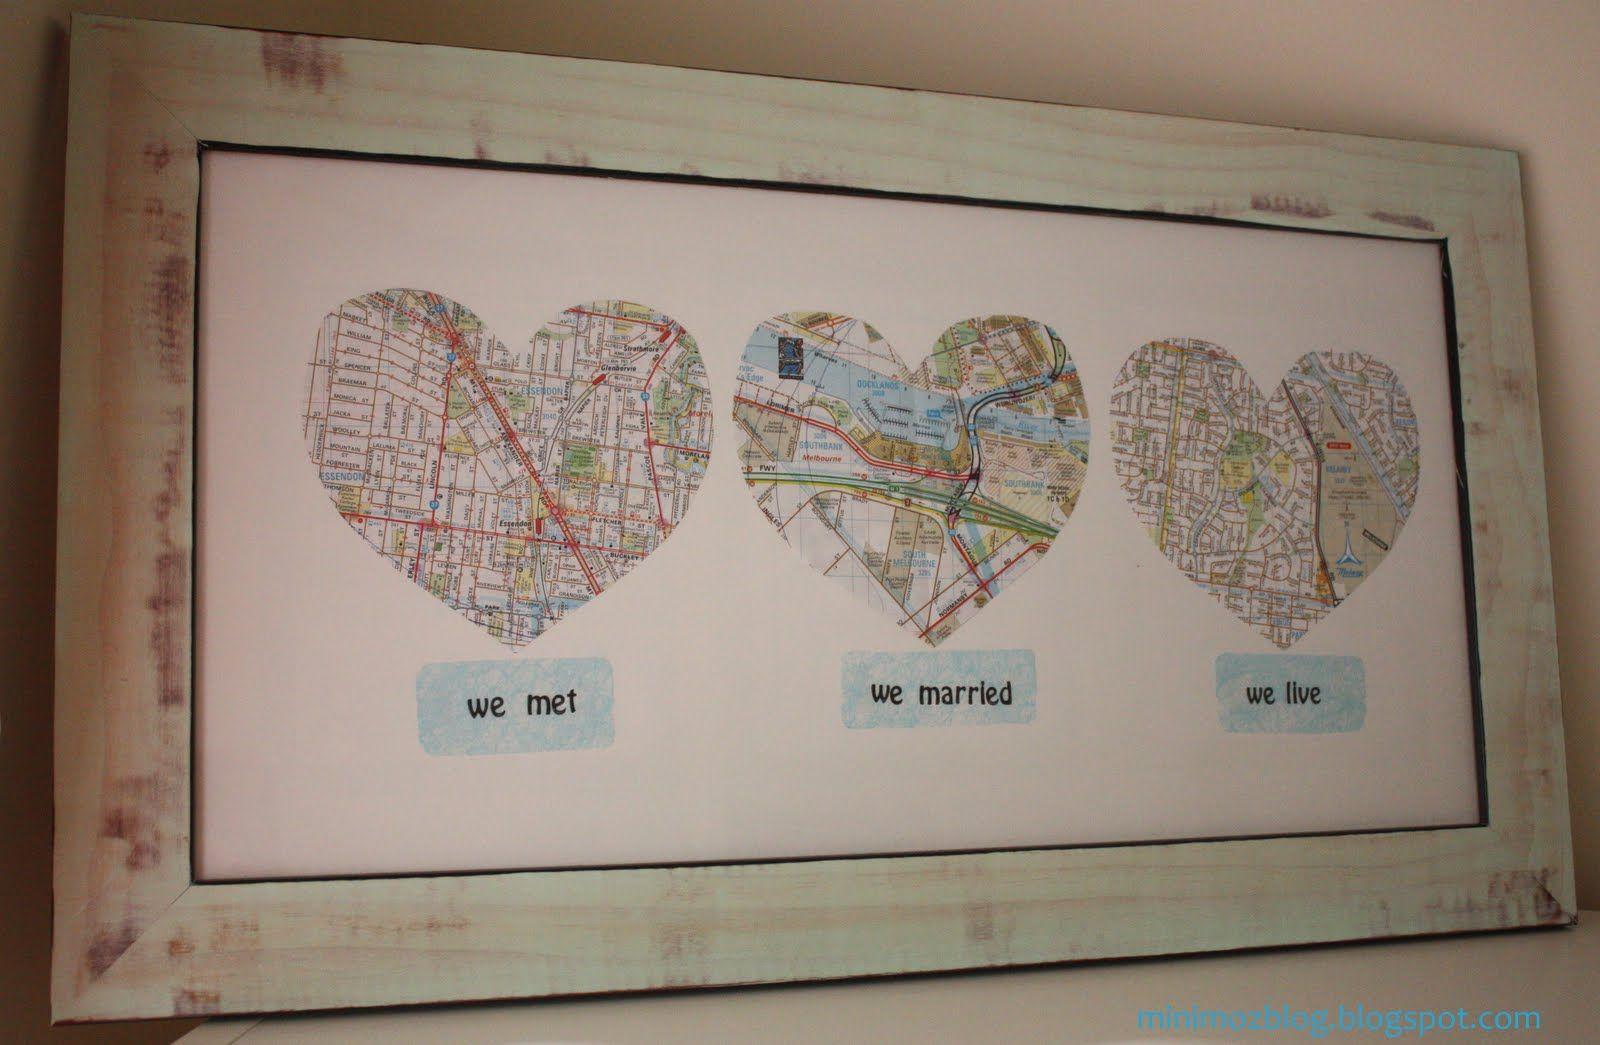 Map met married live love this etcc pinterest diy home